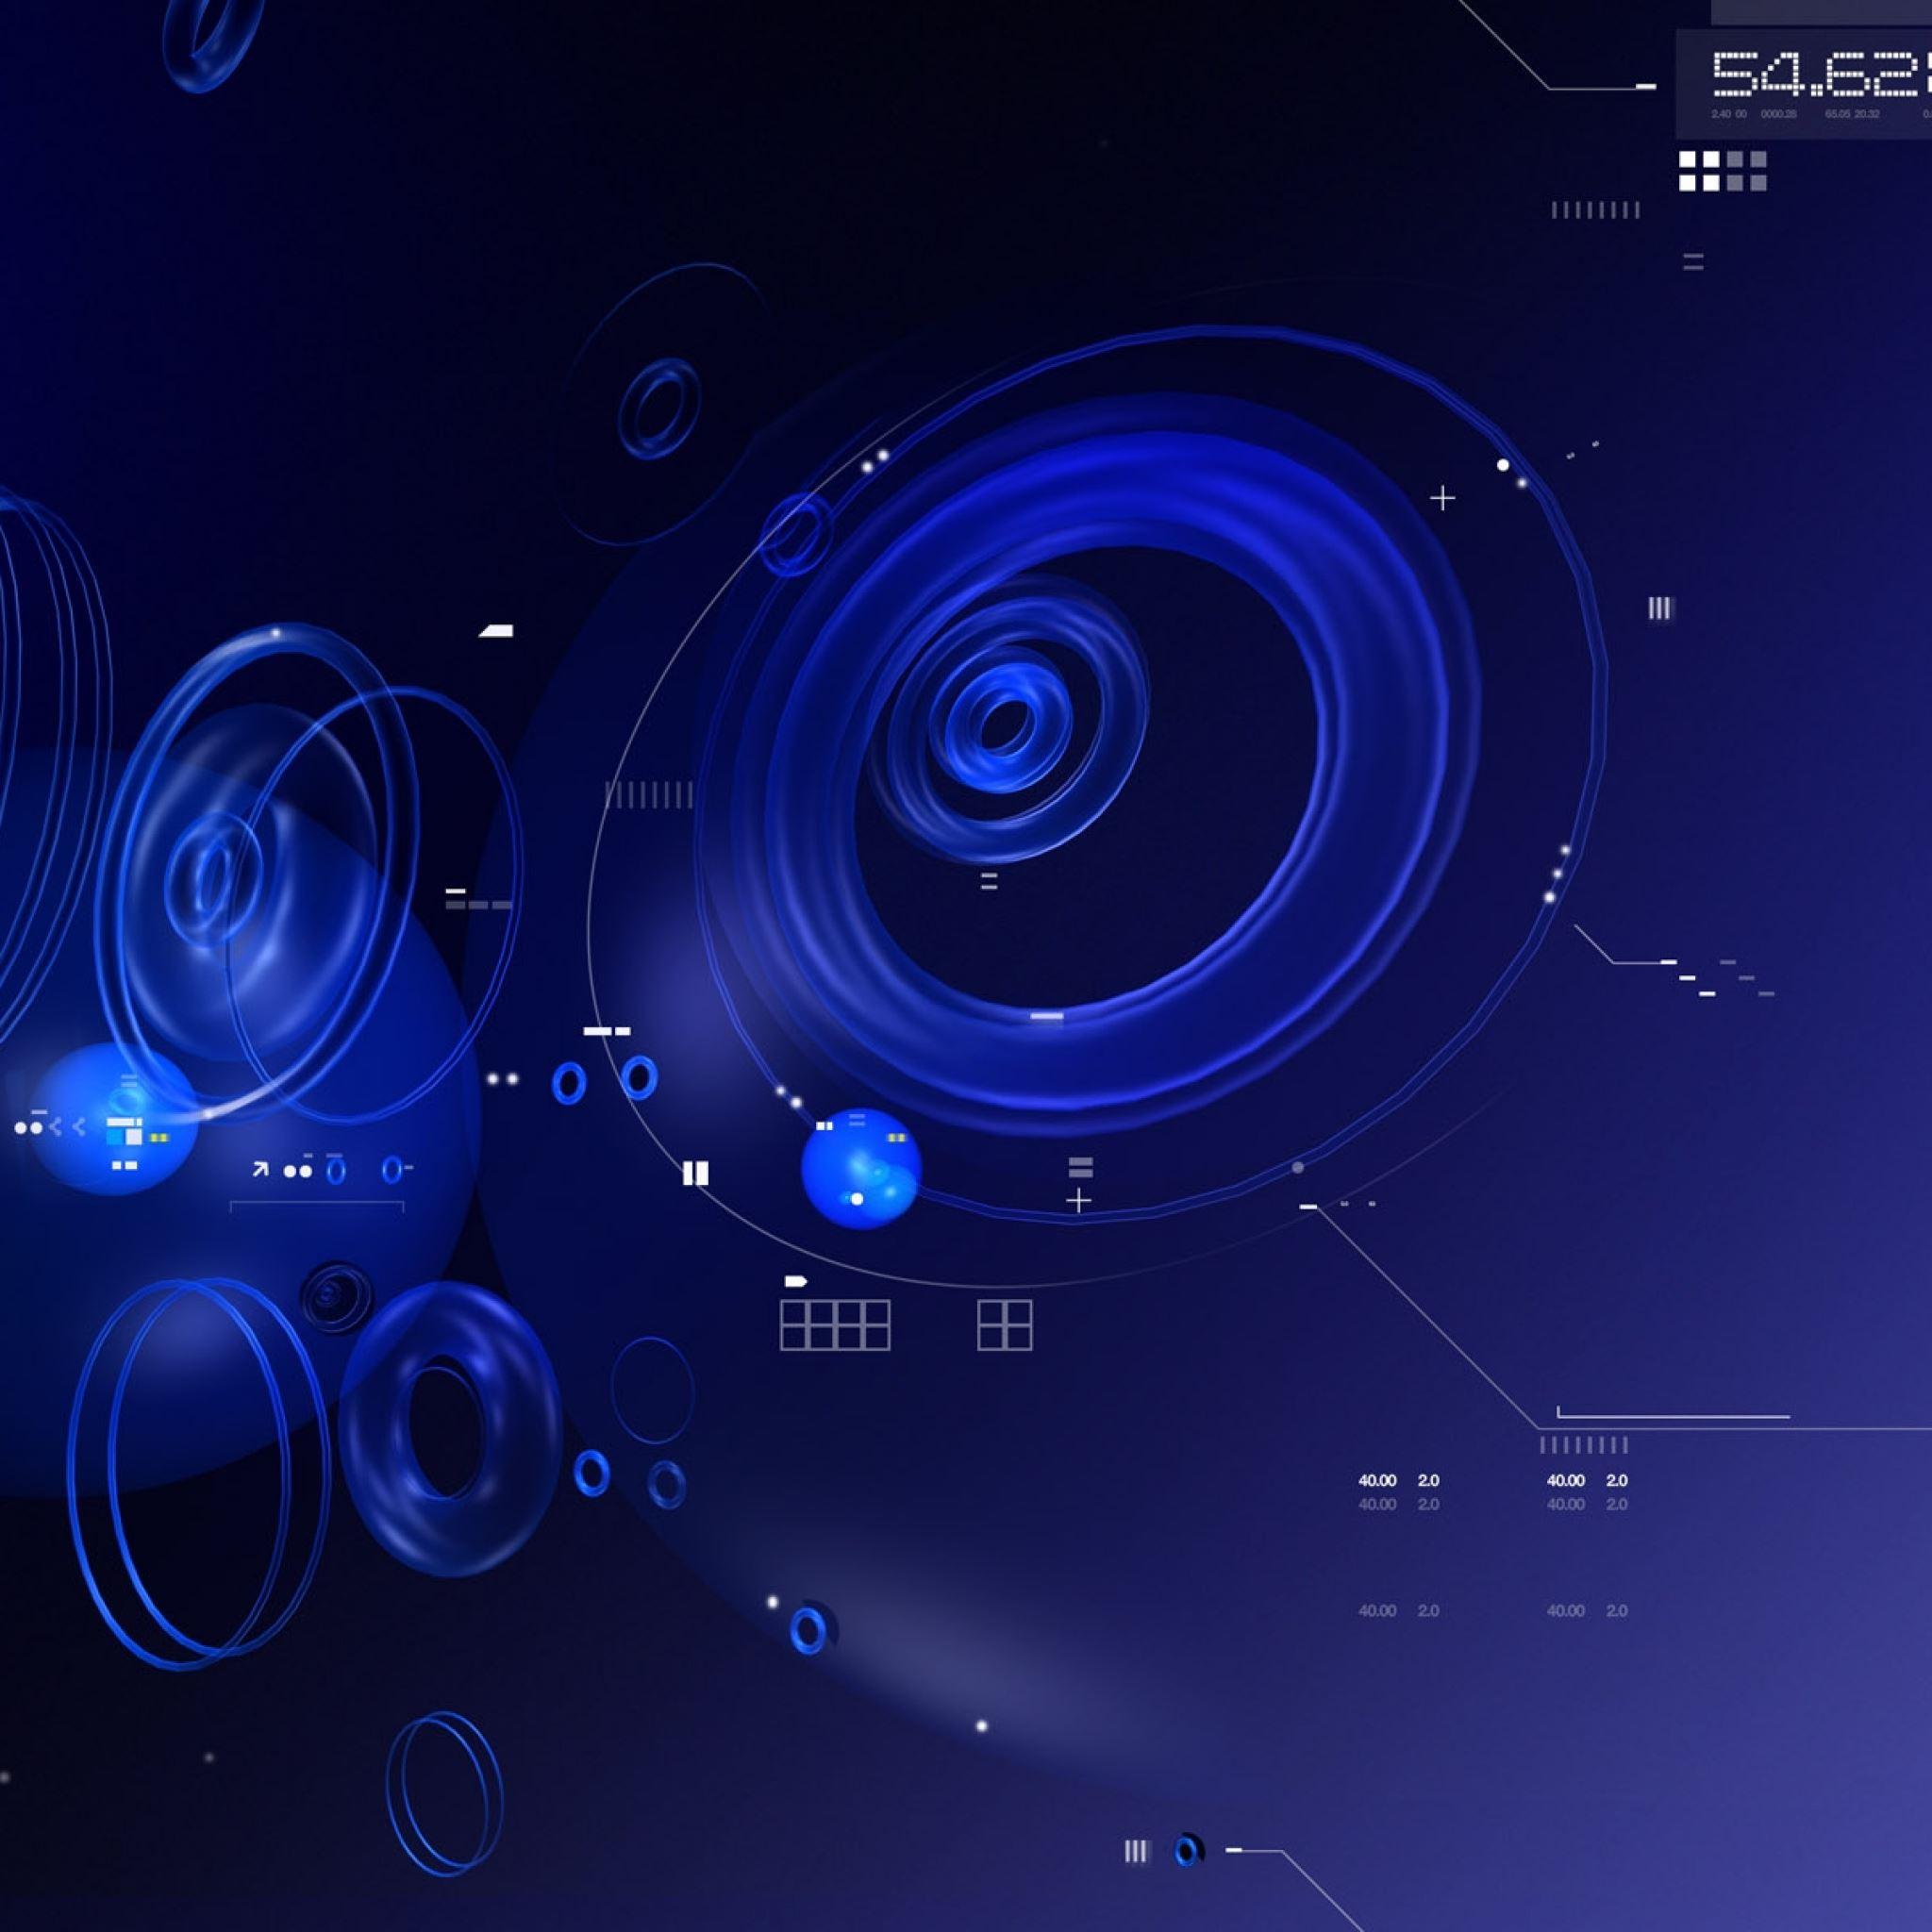 Circles shape blue form system iPad Air wallpaper